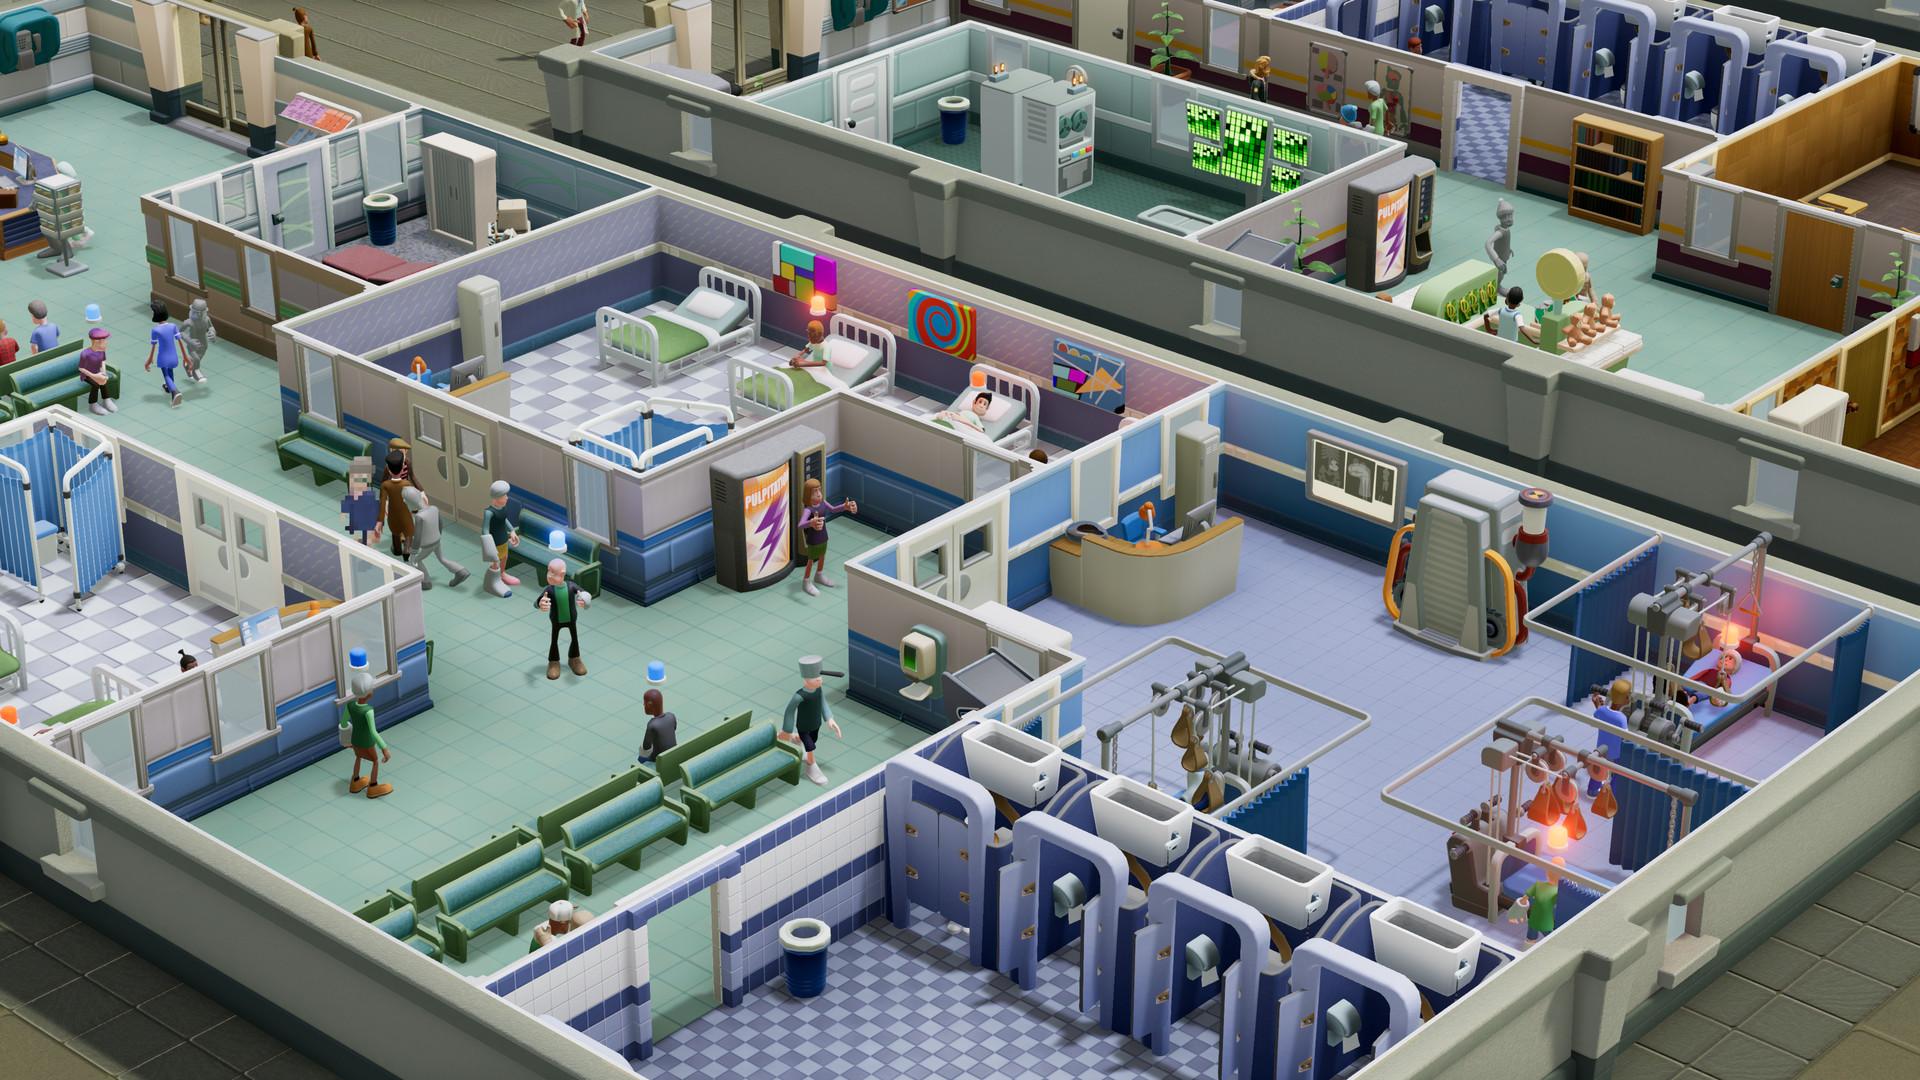 KHAiHOM.com - Two Point Hospital